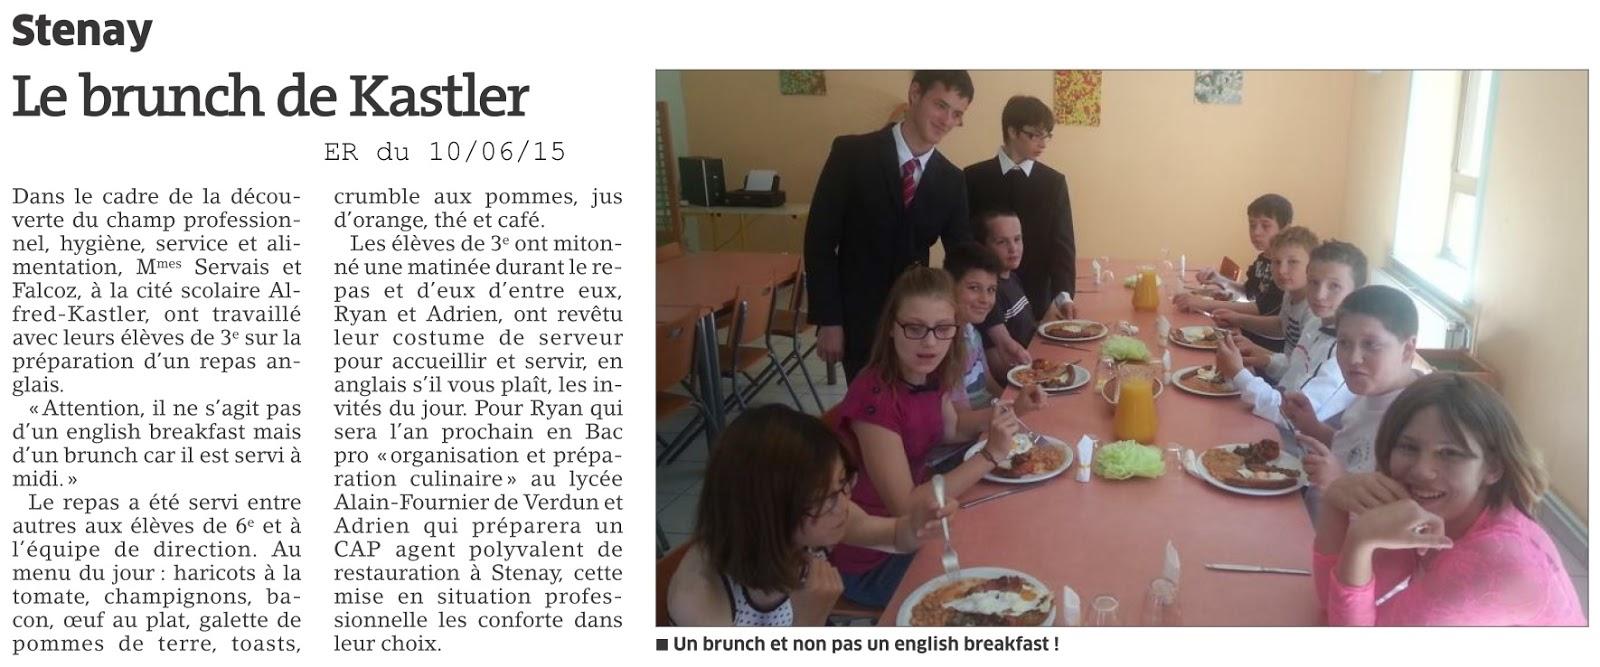 Cit u00e9 scolaire Alfred KASTLER   STENAY  Le brunch des 3 u00e8mes